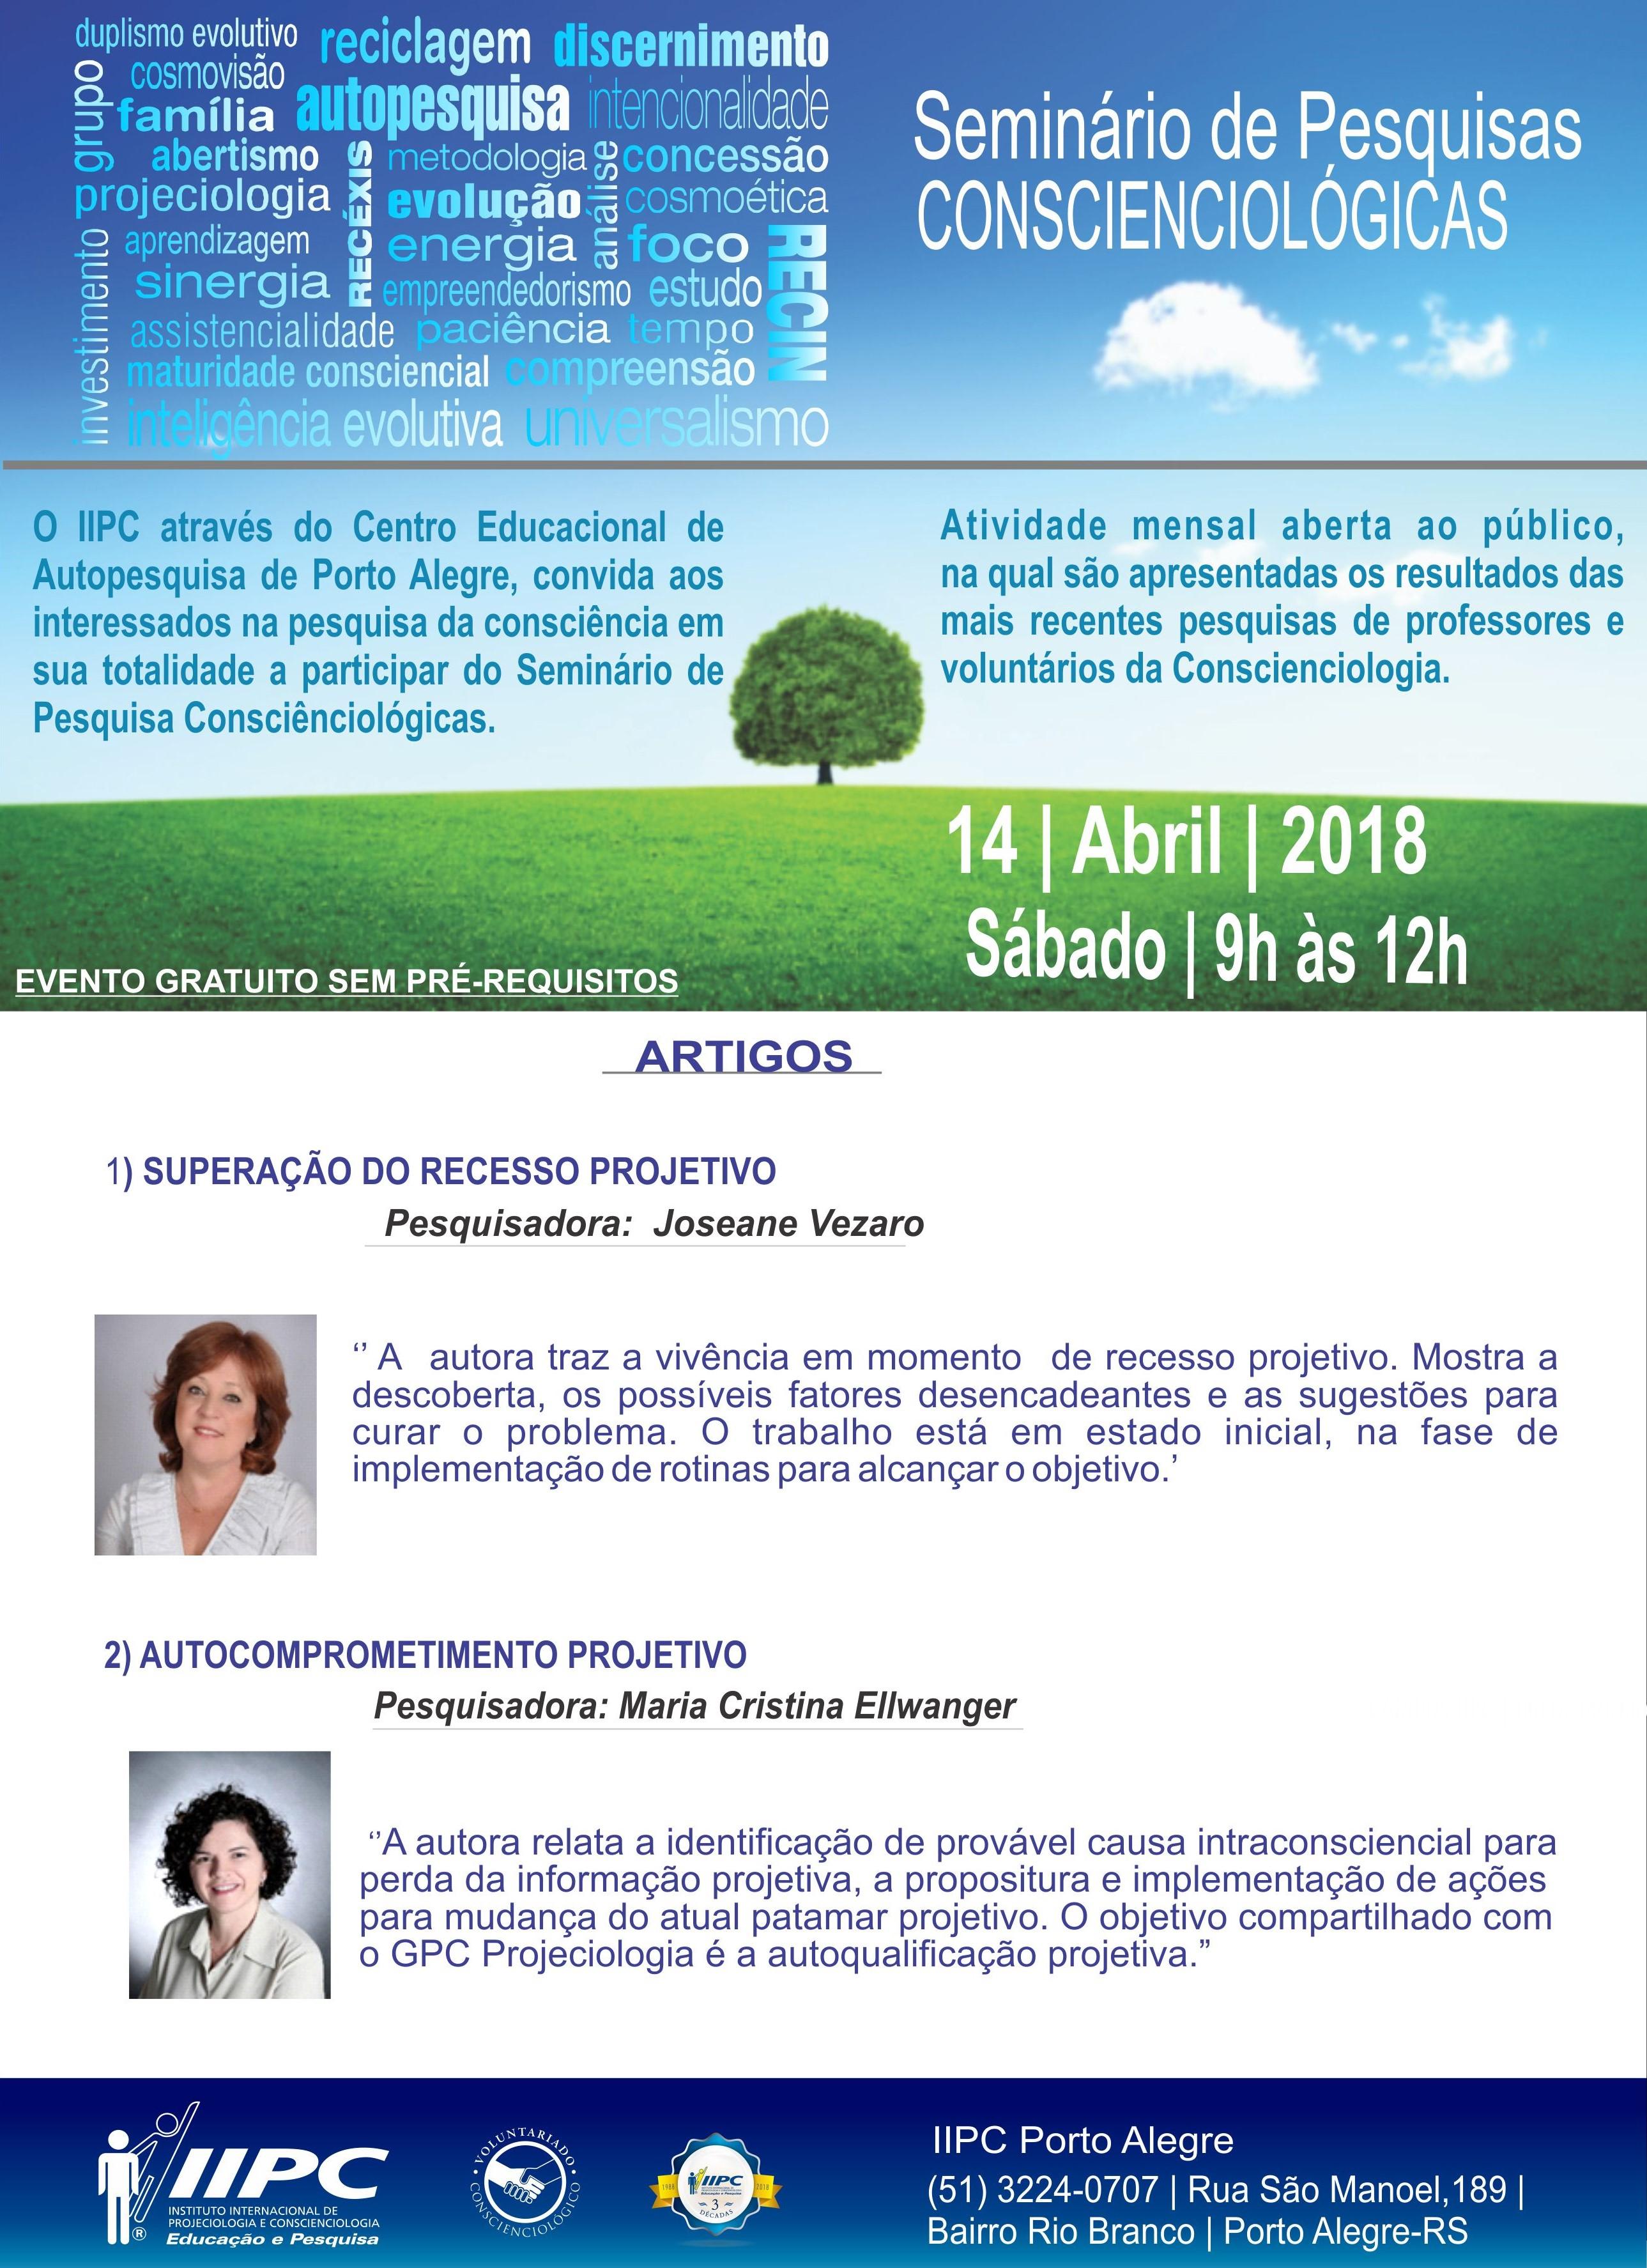 Seminario de pesquisas abril 2018